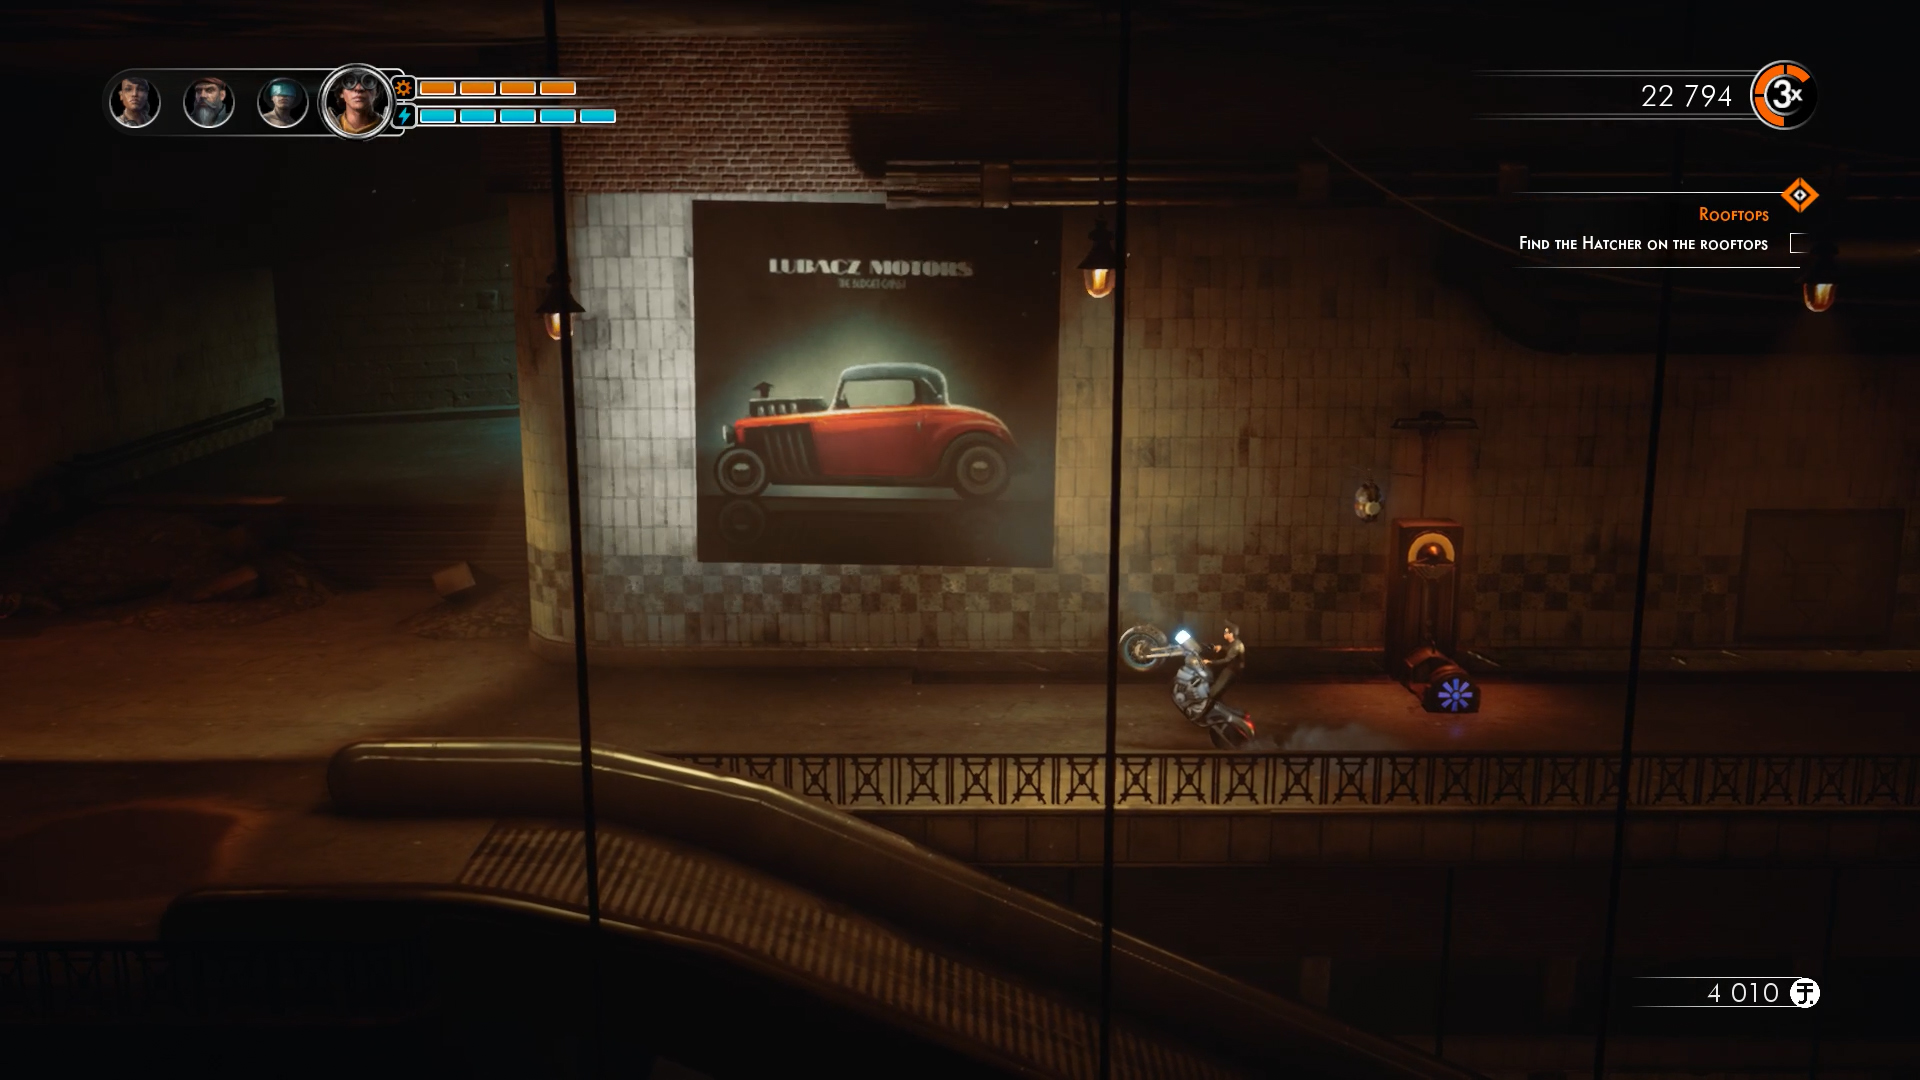 Steel Rats screenshot 2.